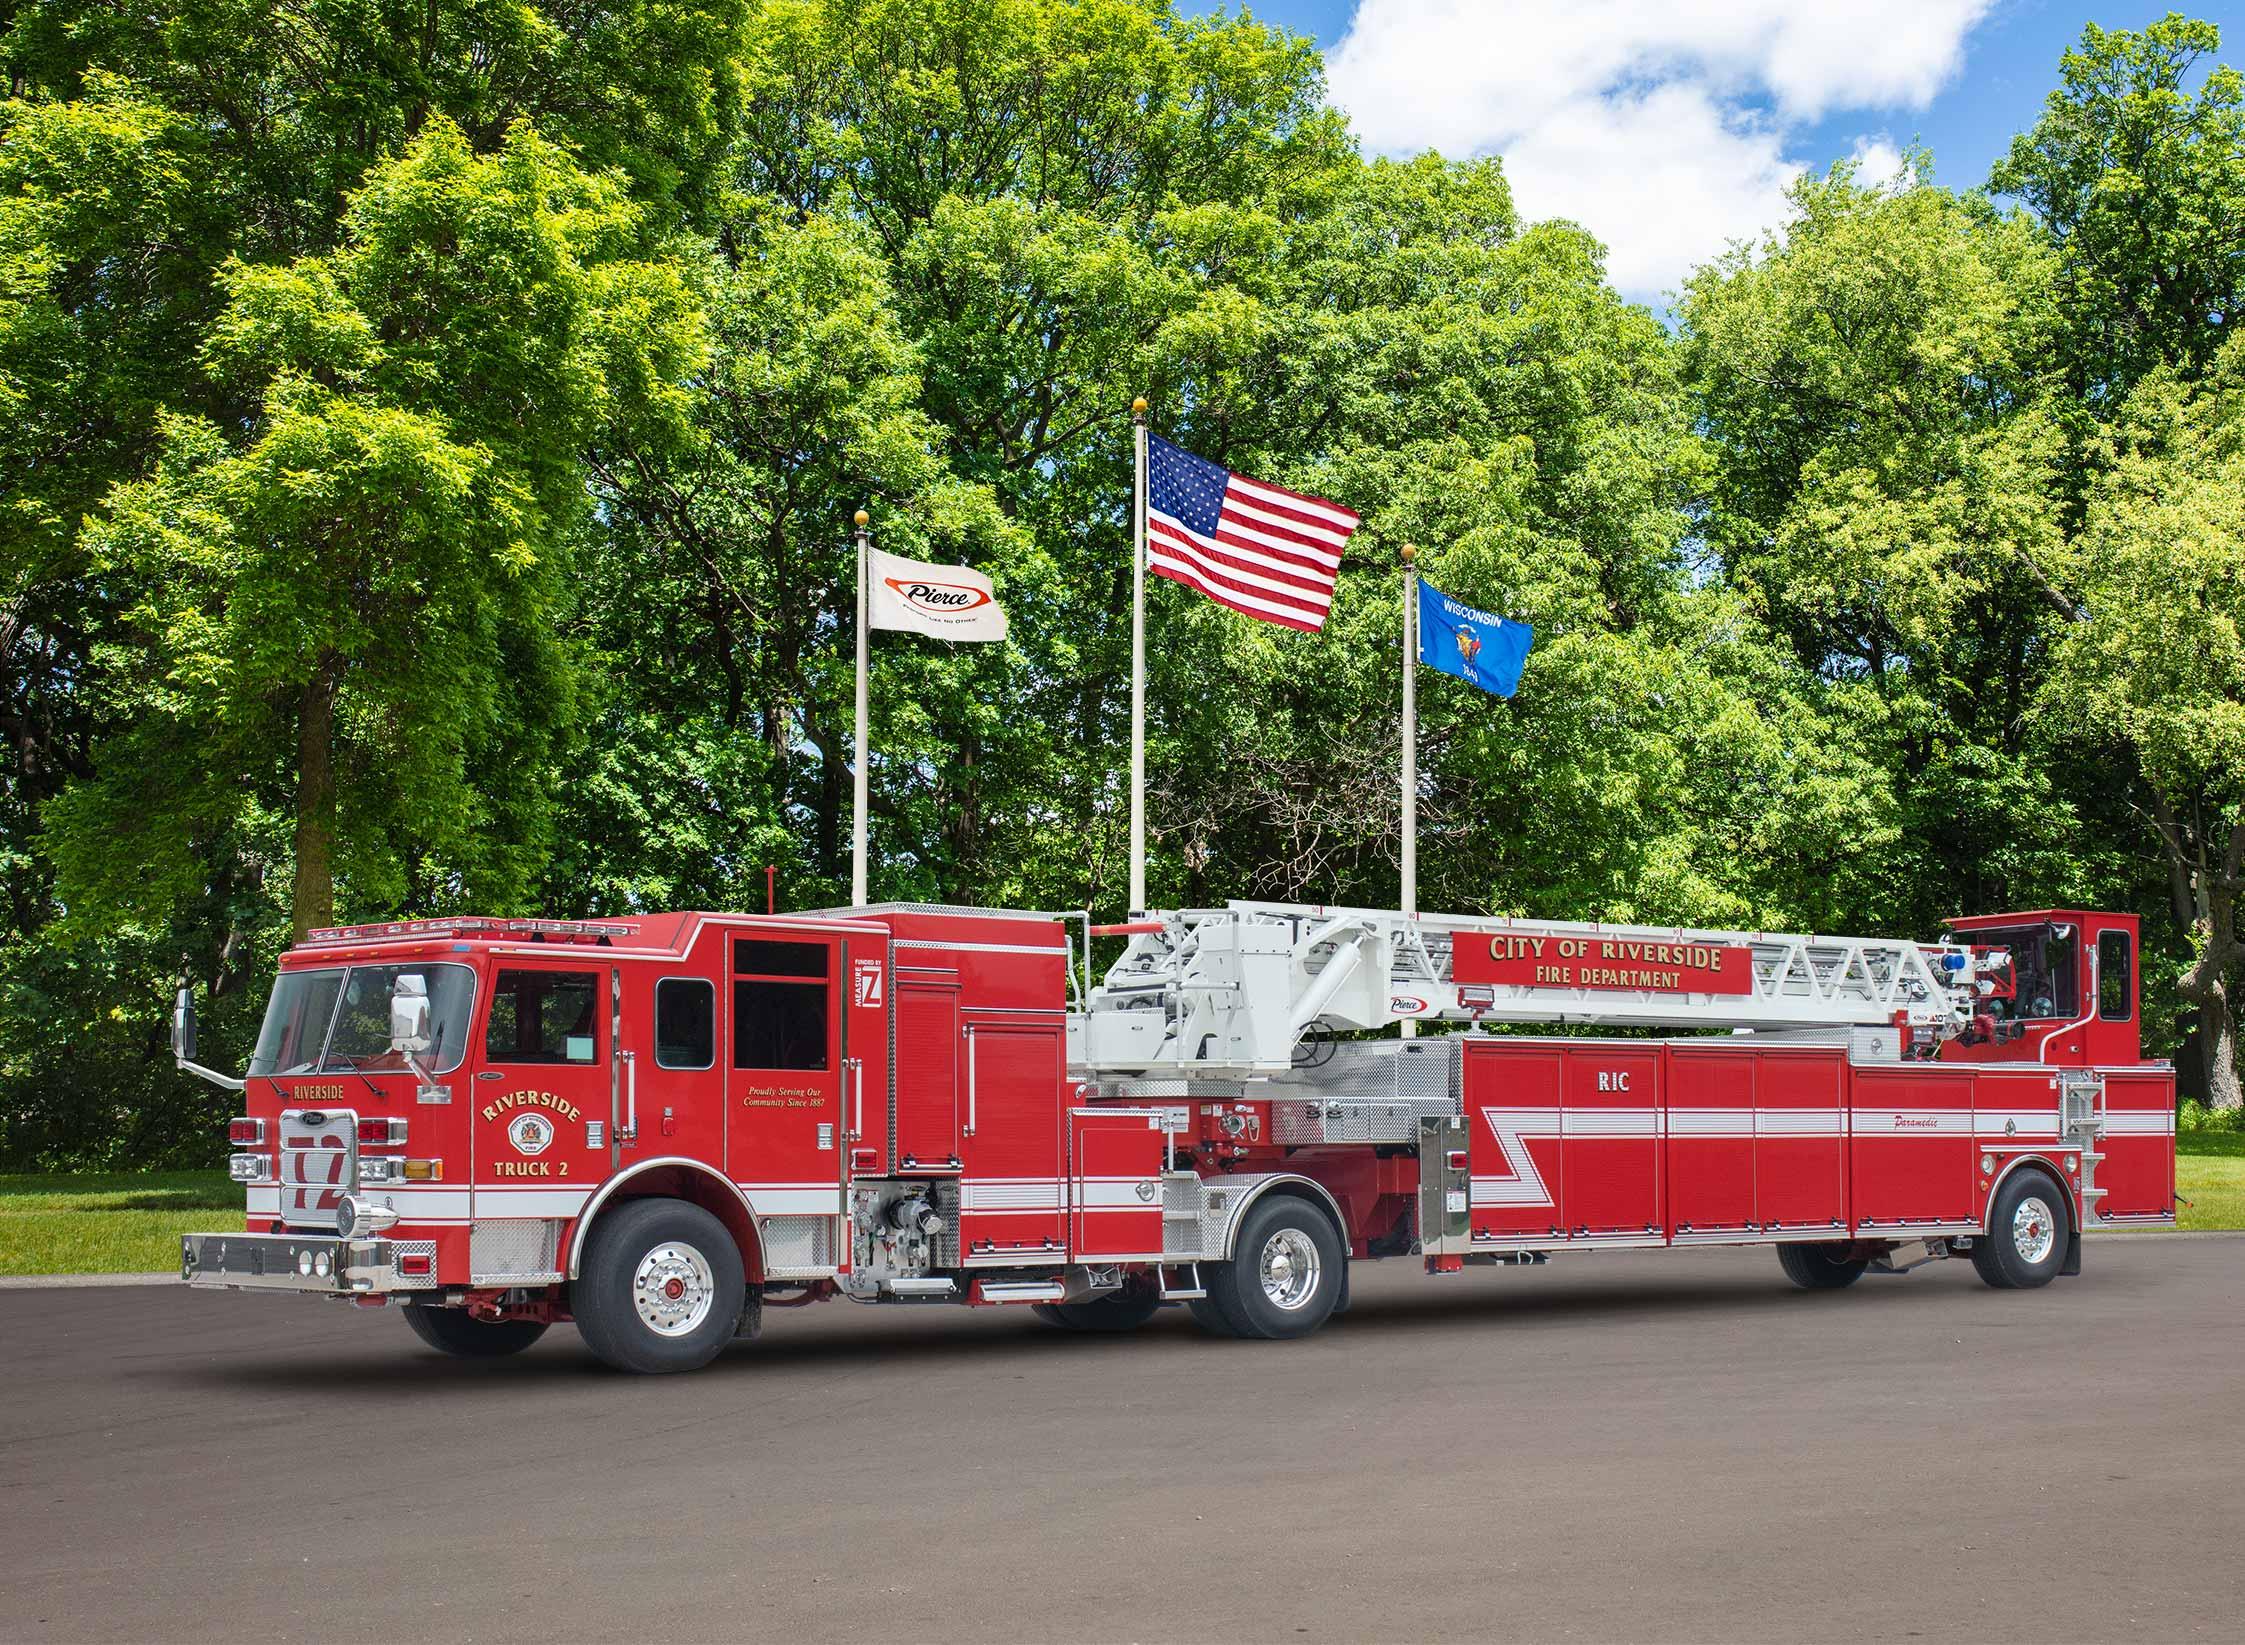 Riverside City Fire Department - Aerial